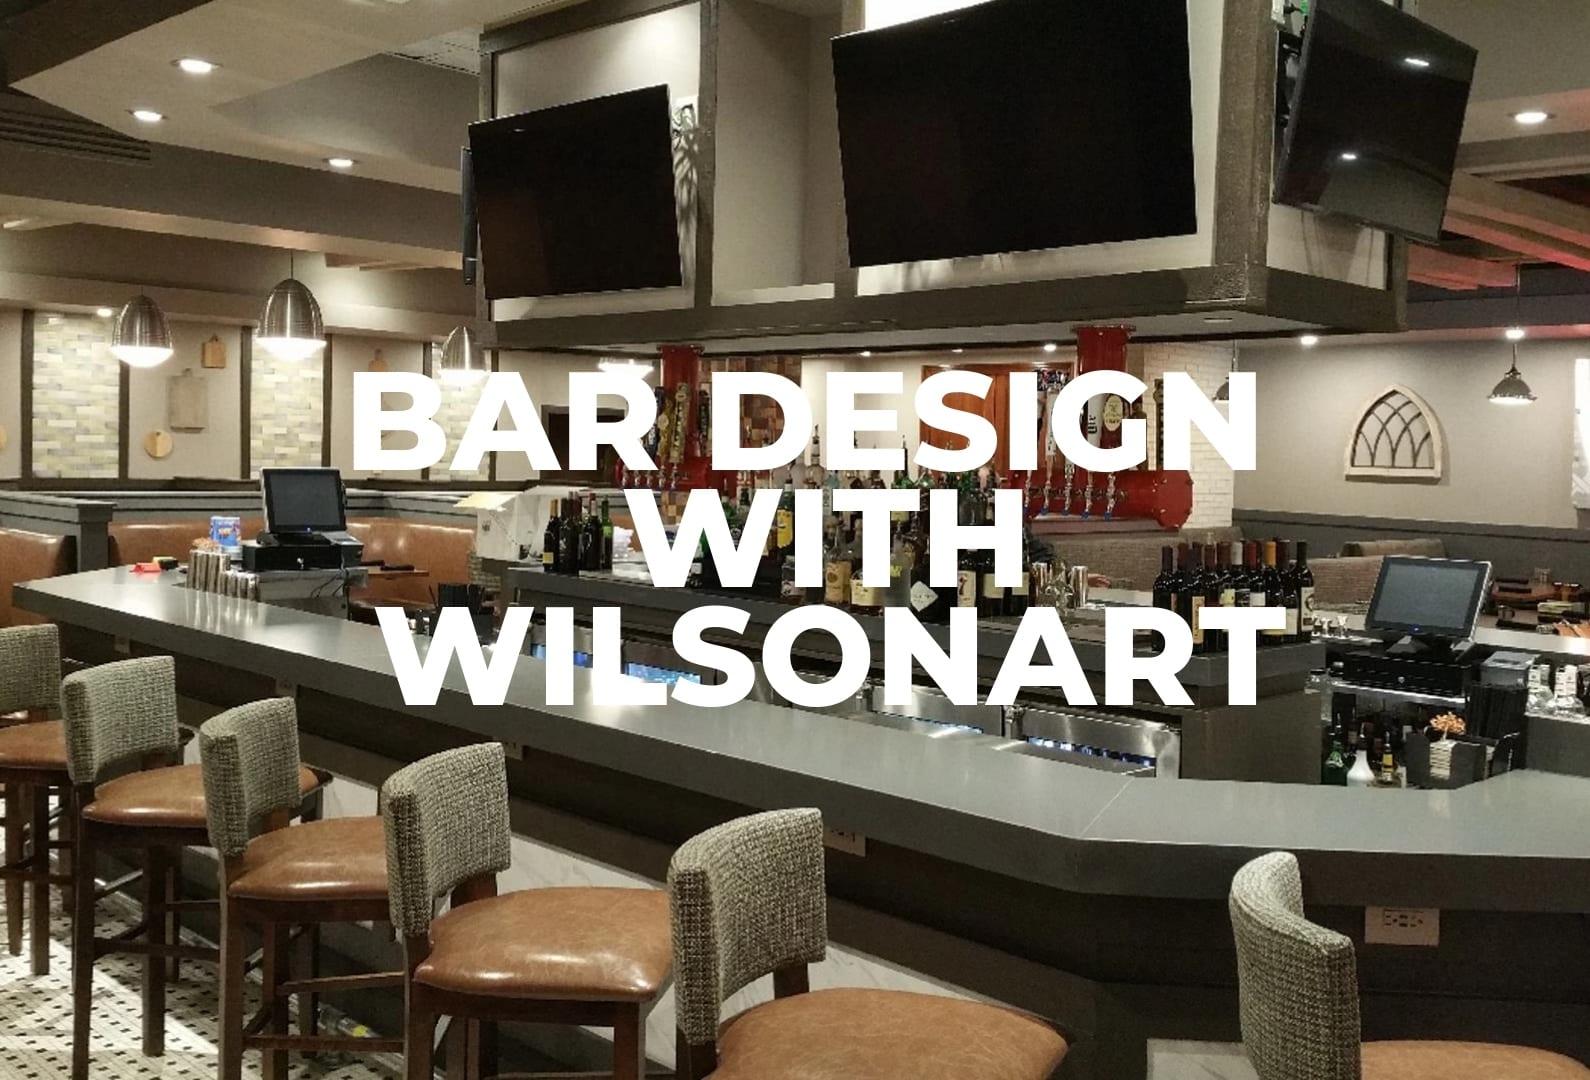 BAR-DESIGN-WITH-WILSONART-3-TN